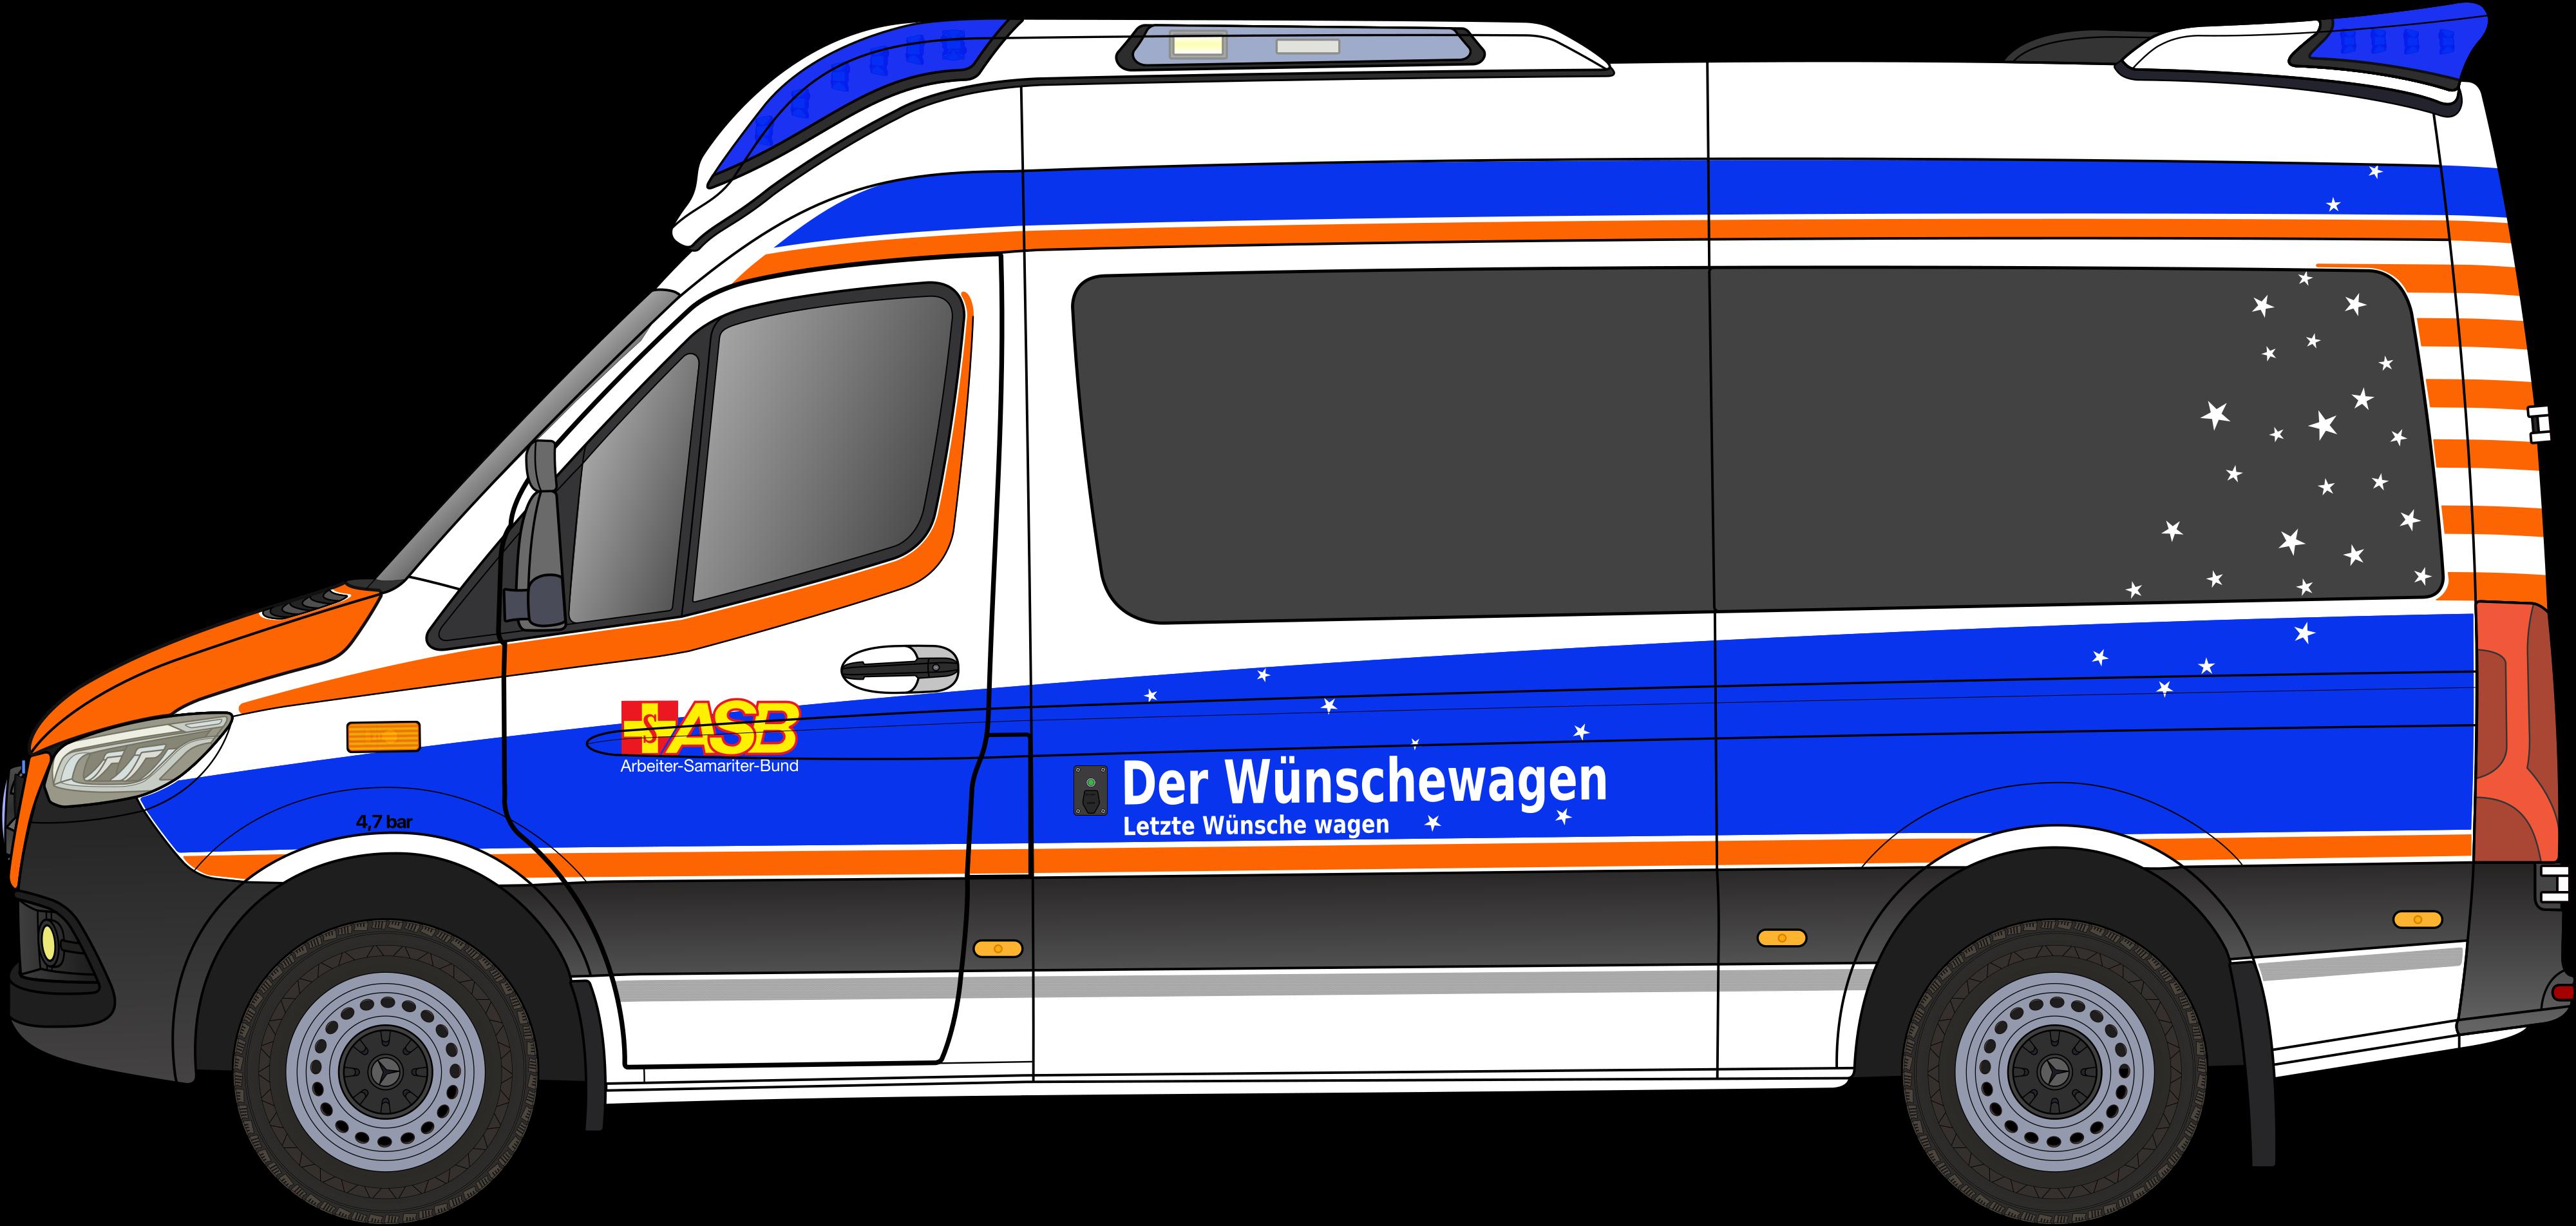 70350-w%C3%BCnschewagen-png